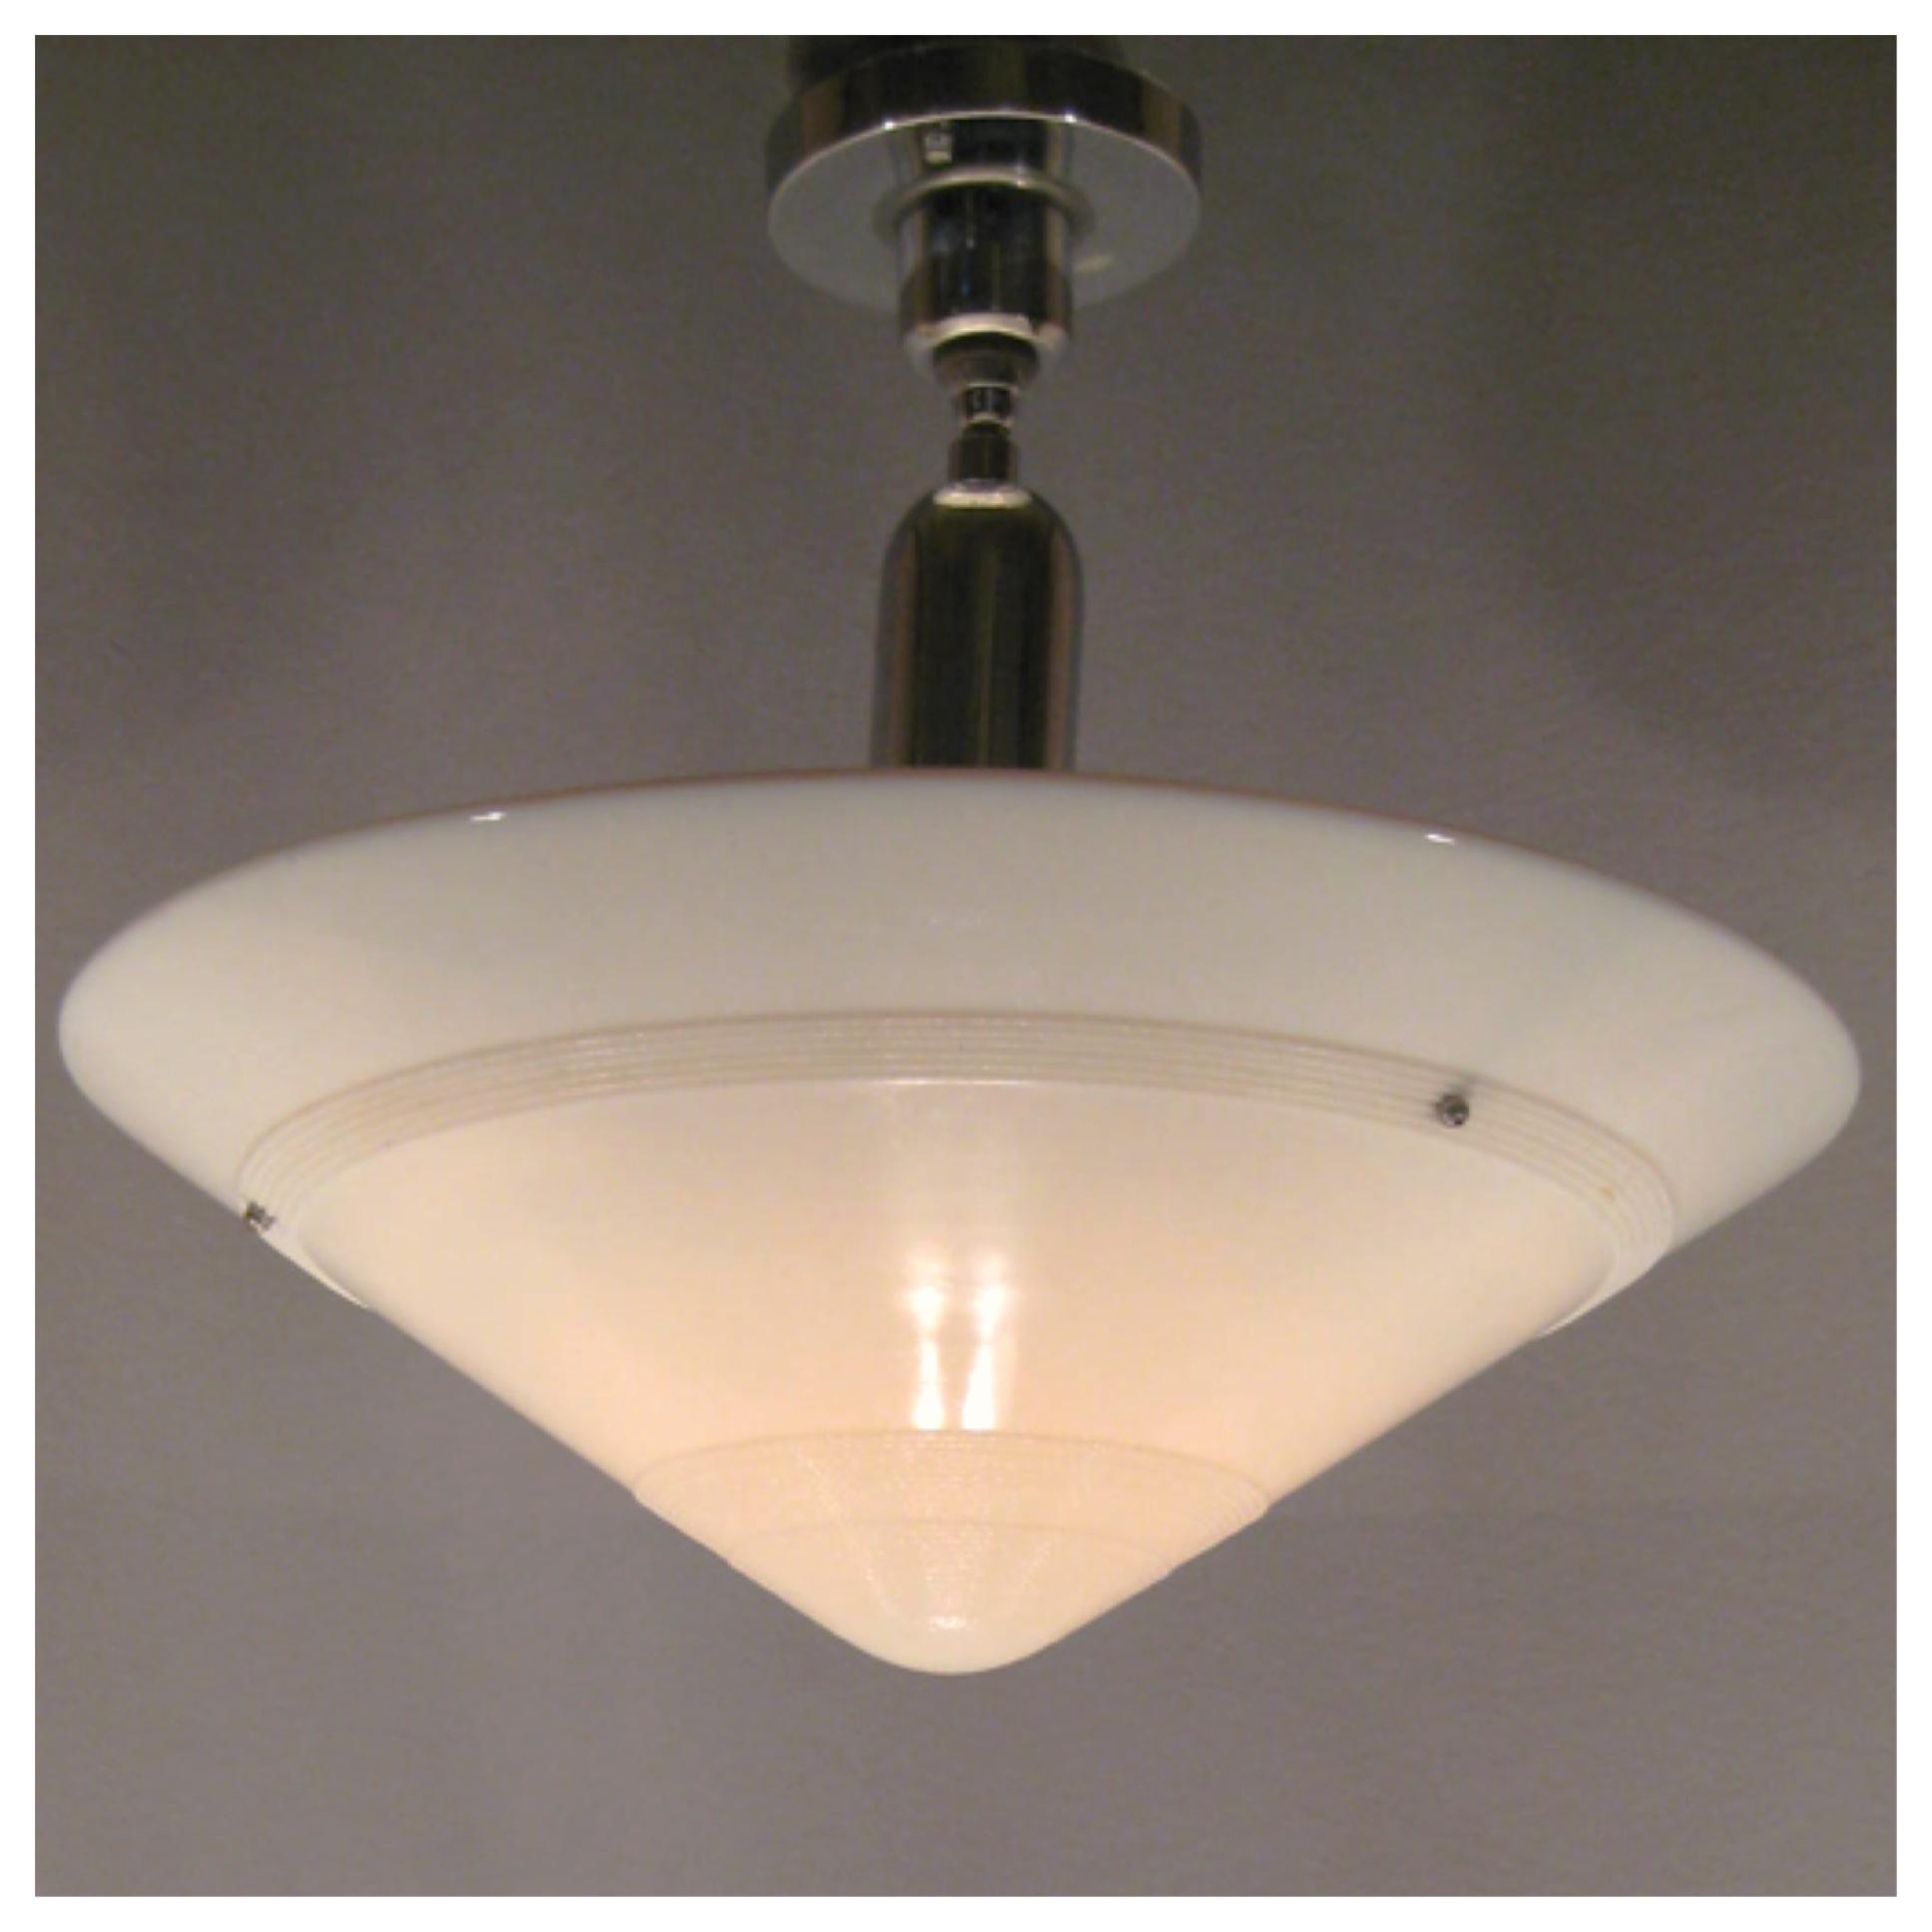 deco french chandelier pin ebay paravas art ceiling noverdy light ceilings